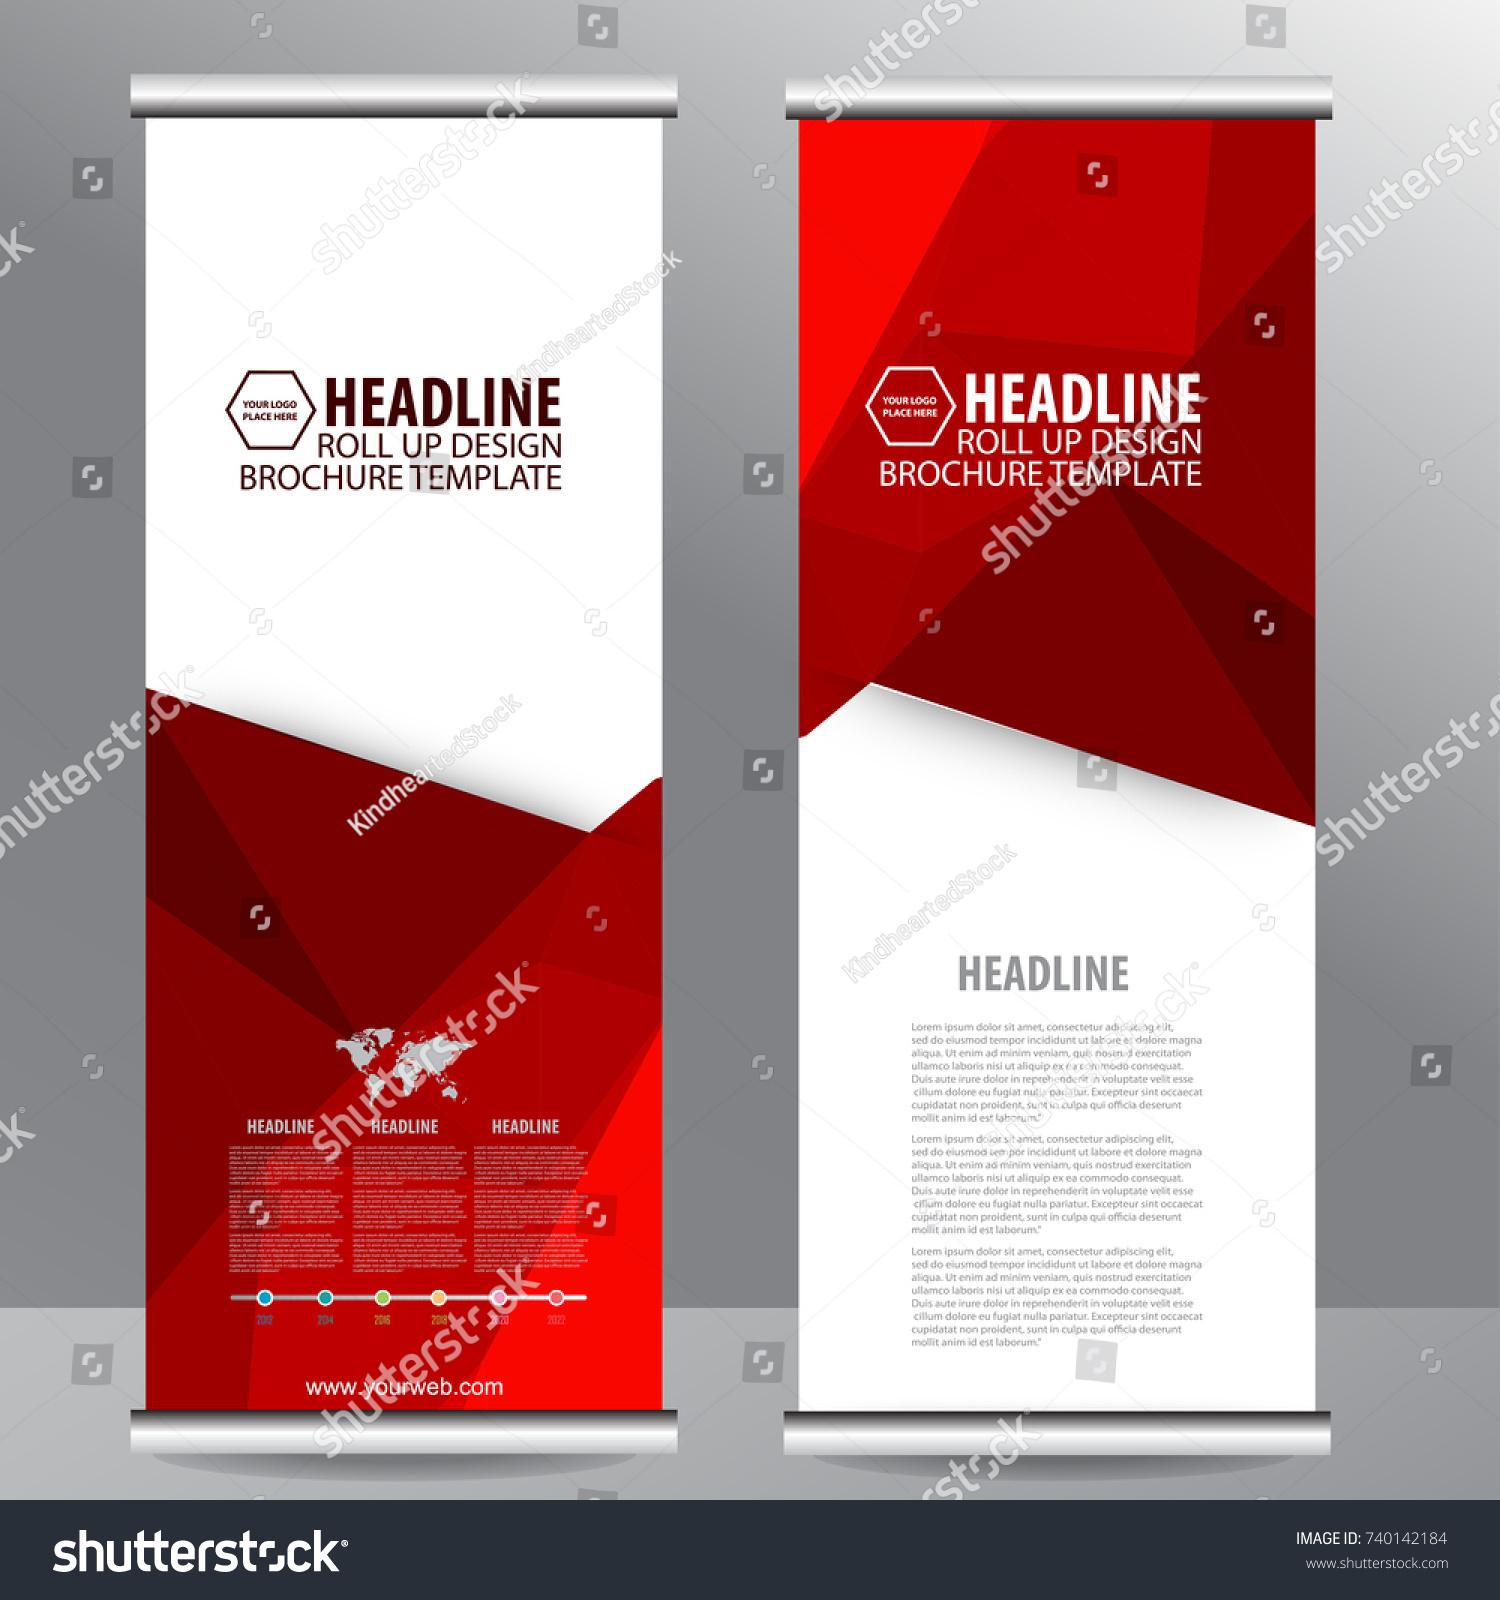 roll business brochure flyer banner design のベクター画像素材